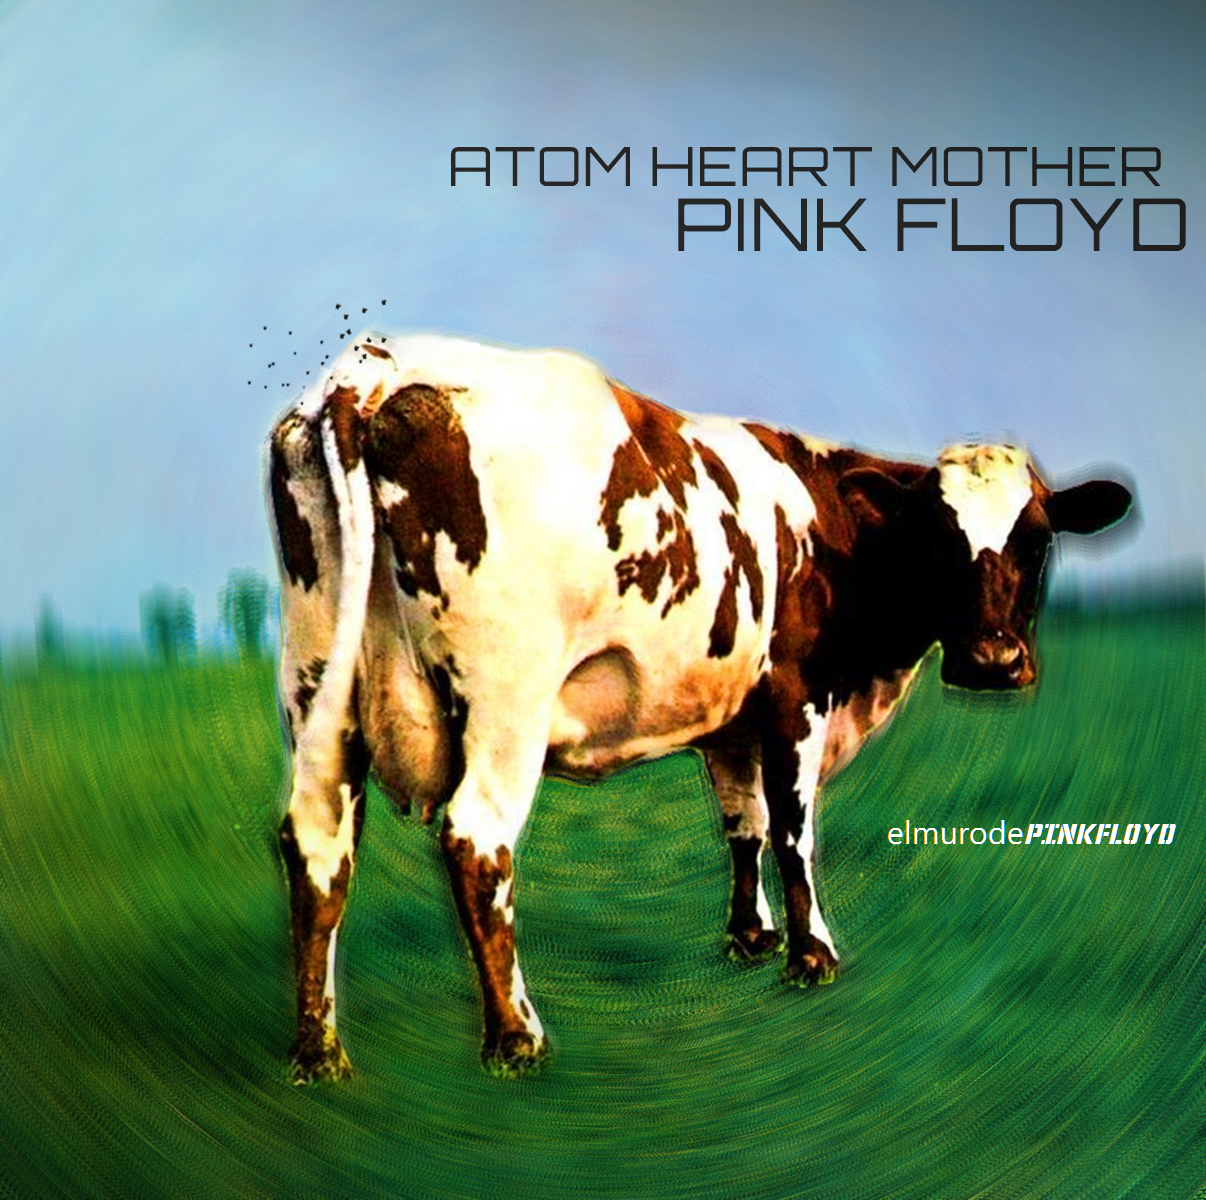 Atom Heart Mother Pink Floyd Pink Floyd Album Covers